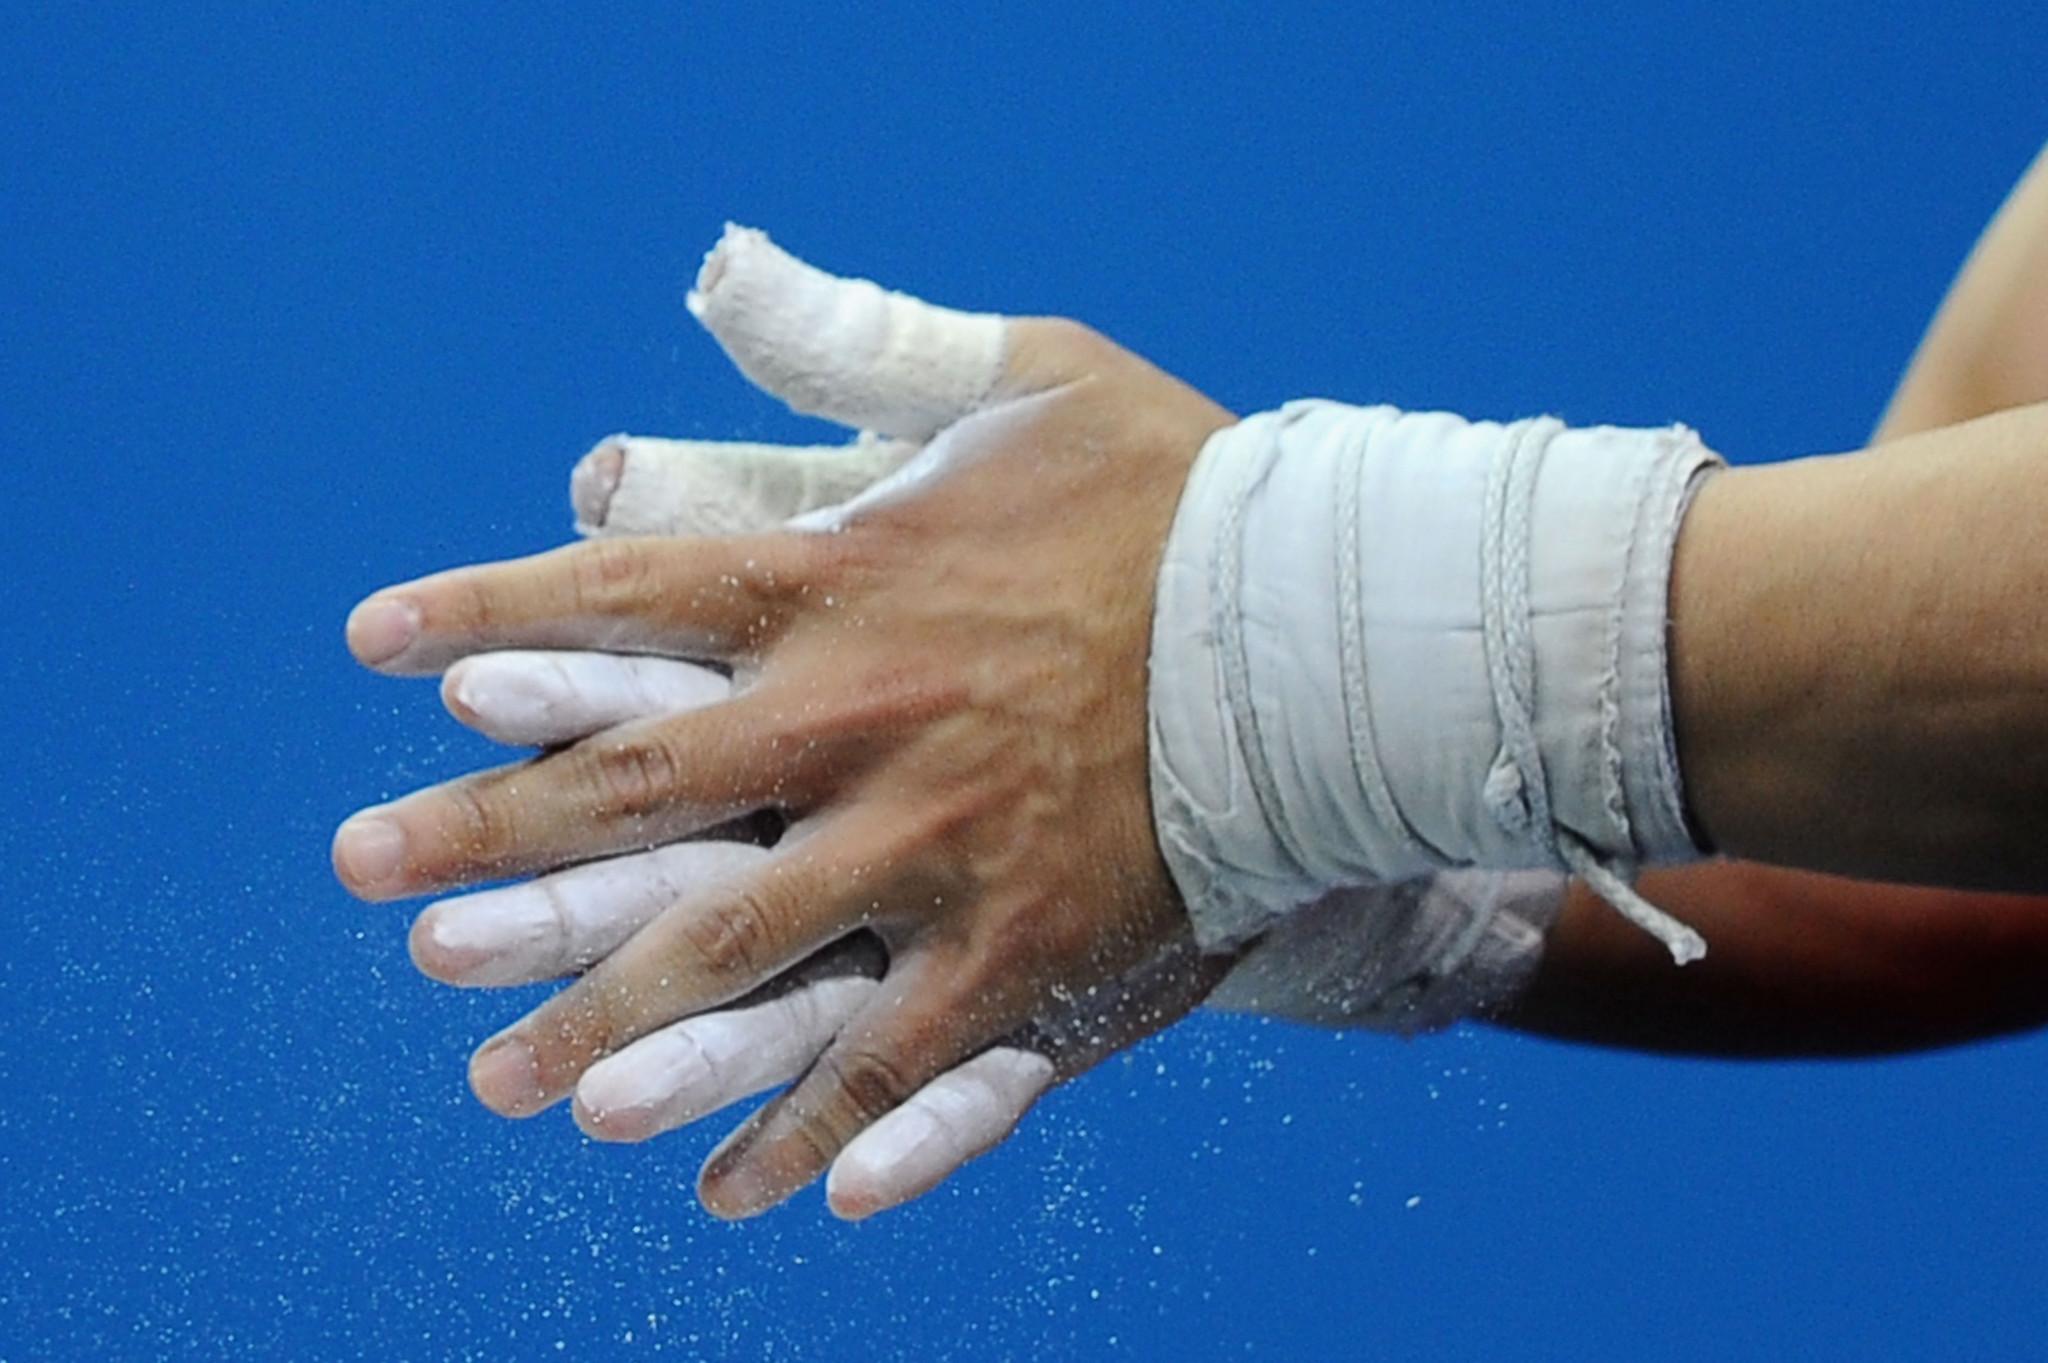 Kamila Konotop set a junior world record in Tashkent ©Getty Images